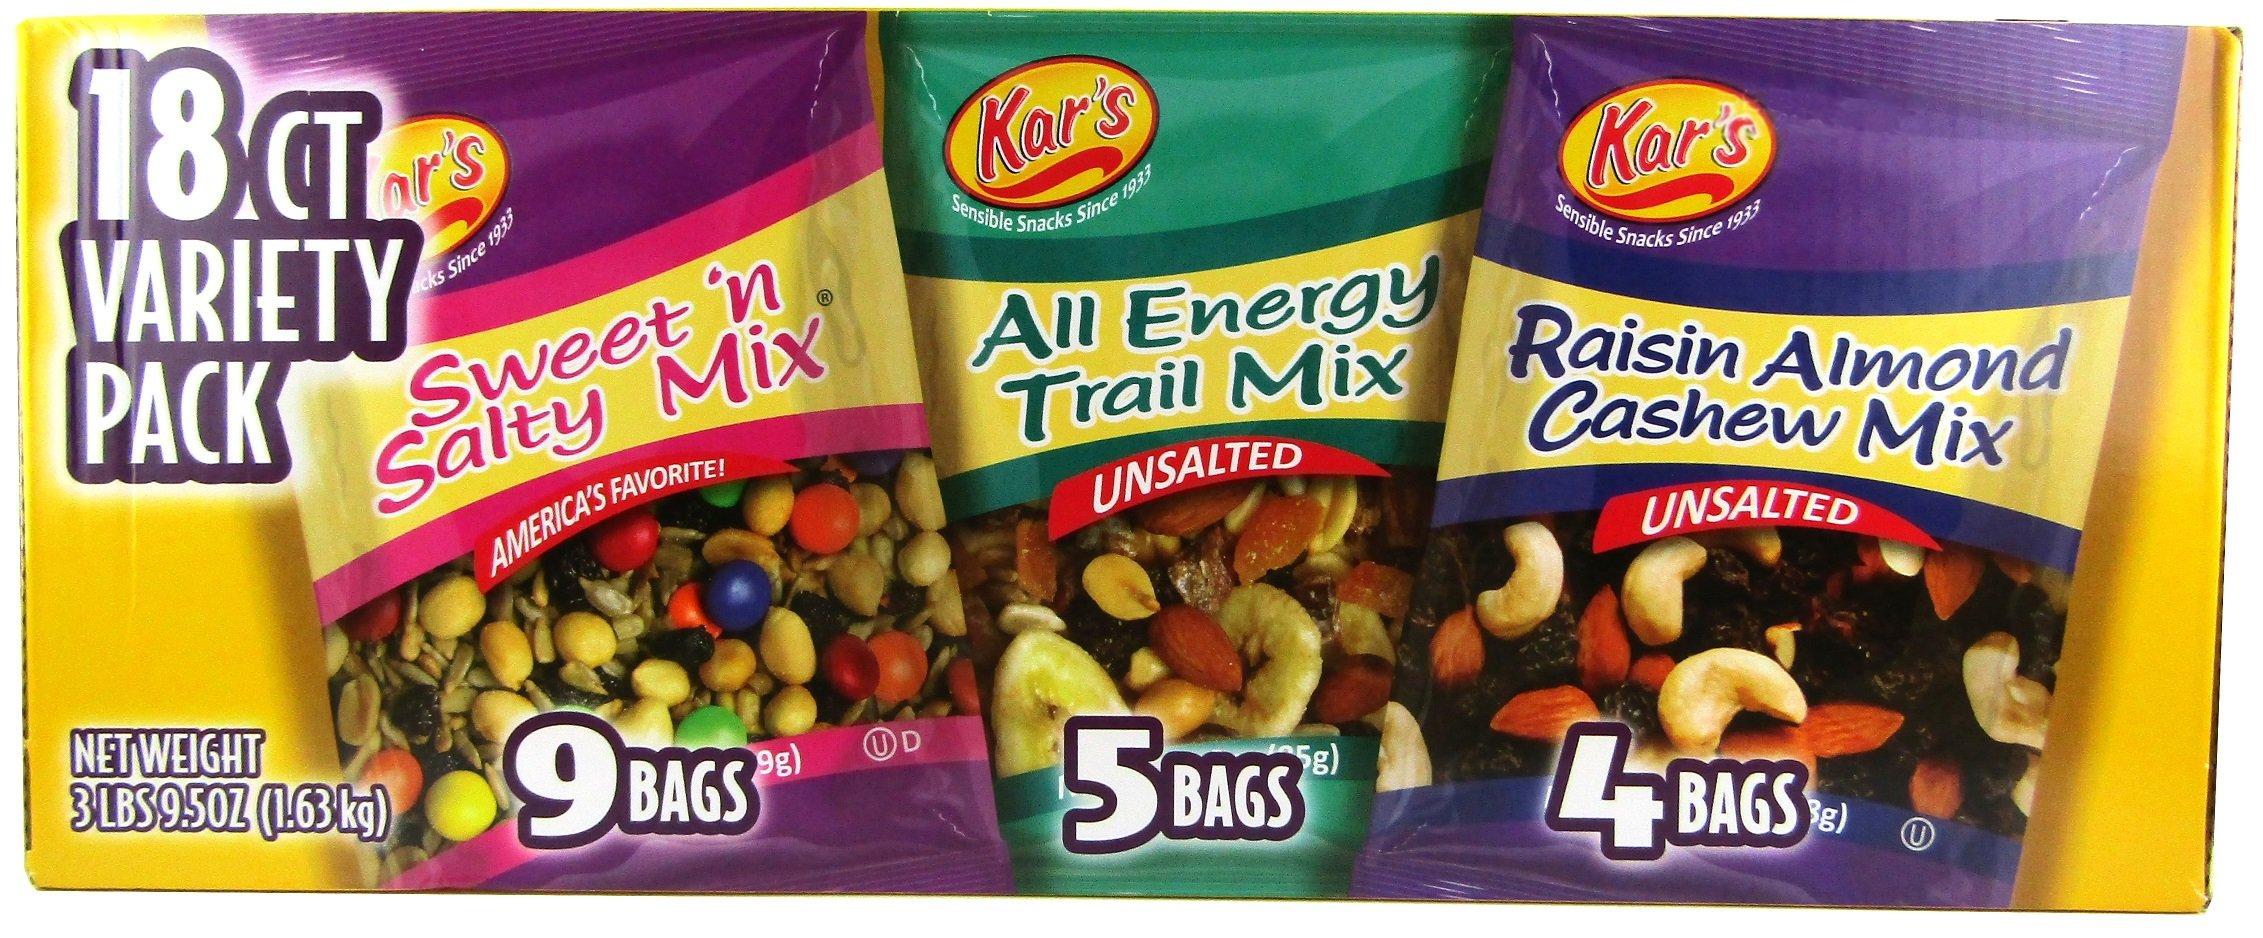 Kar's Nut & Fruit Mix Variety Pack - 18ct